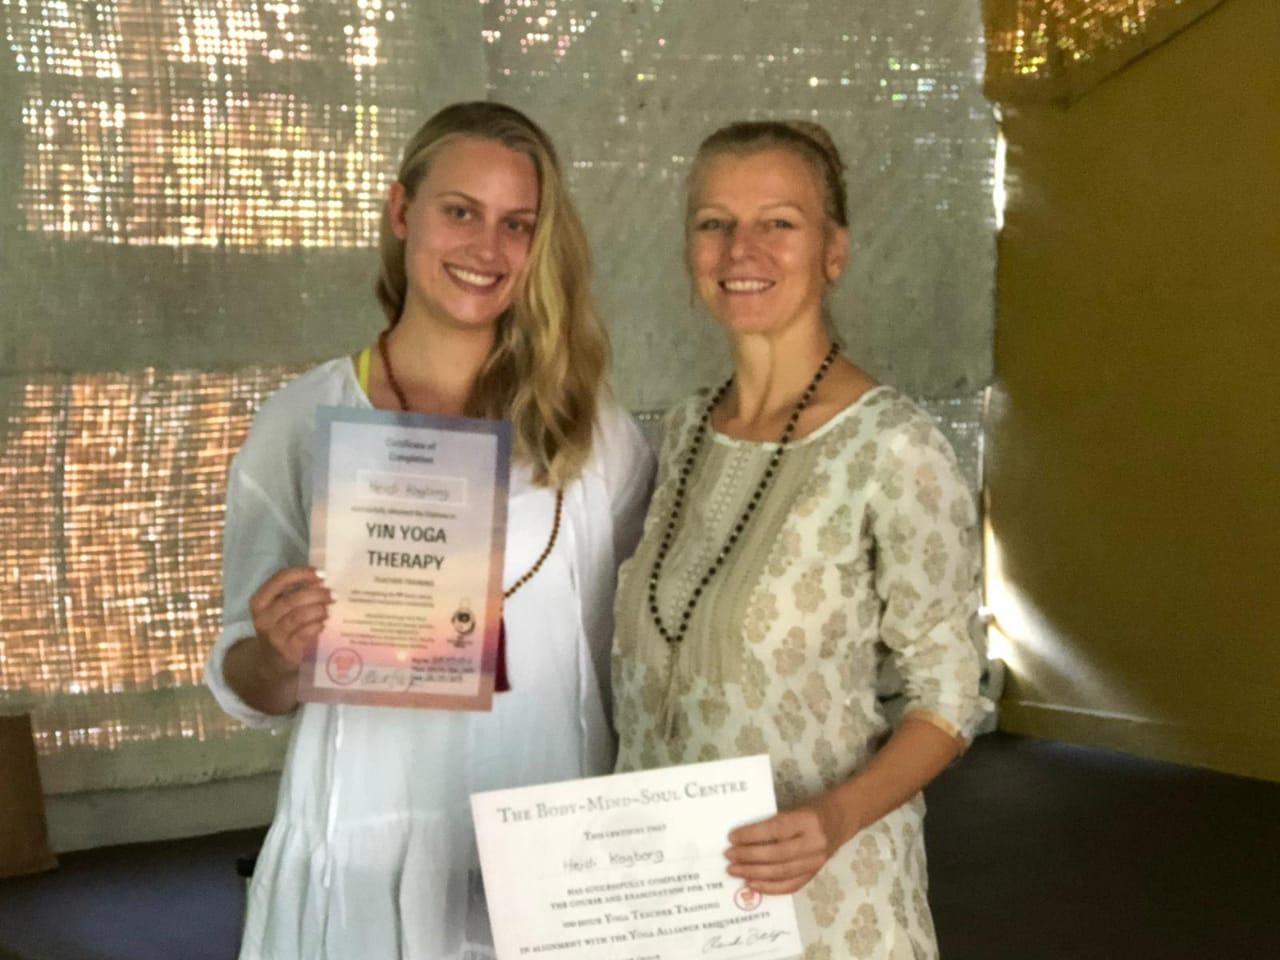 Heidi - Yin Yoga Teacher Training Yoga Alliance Certificate